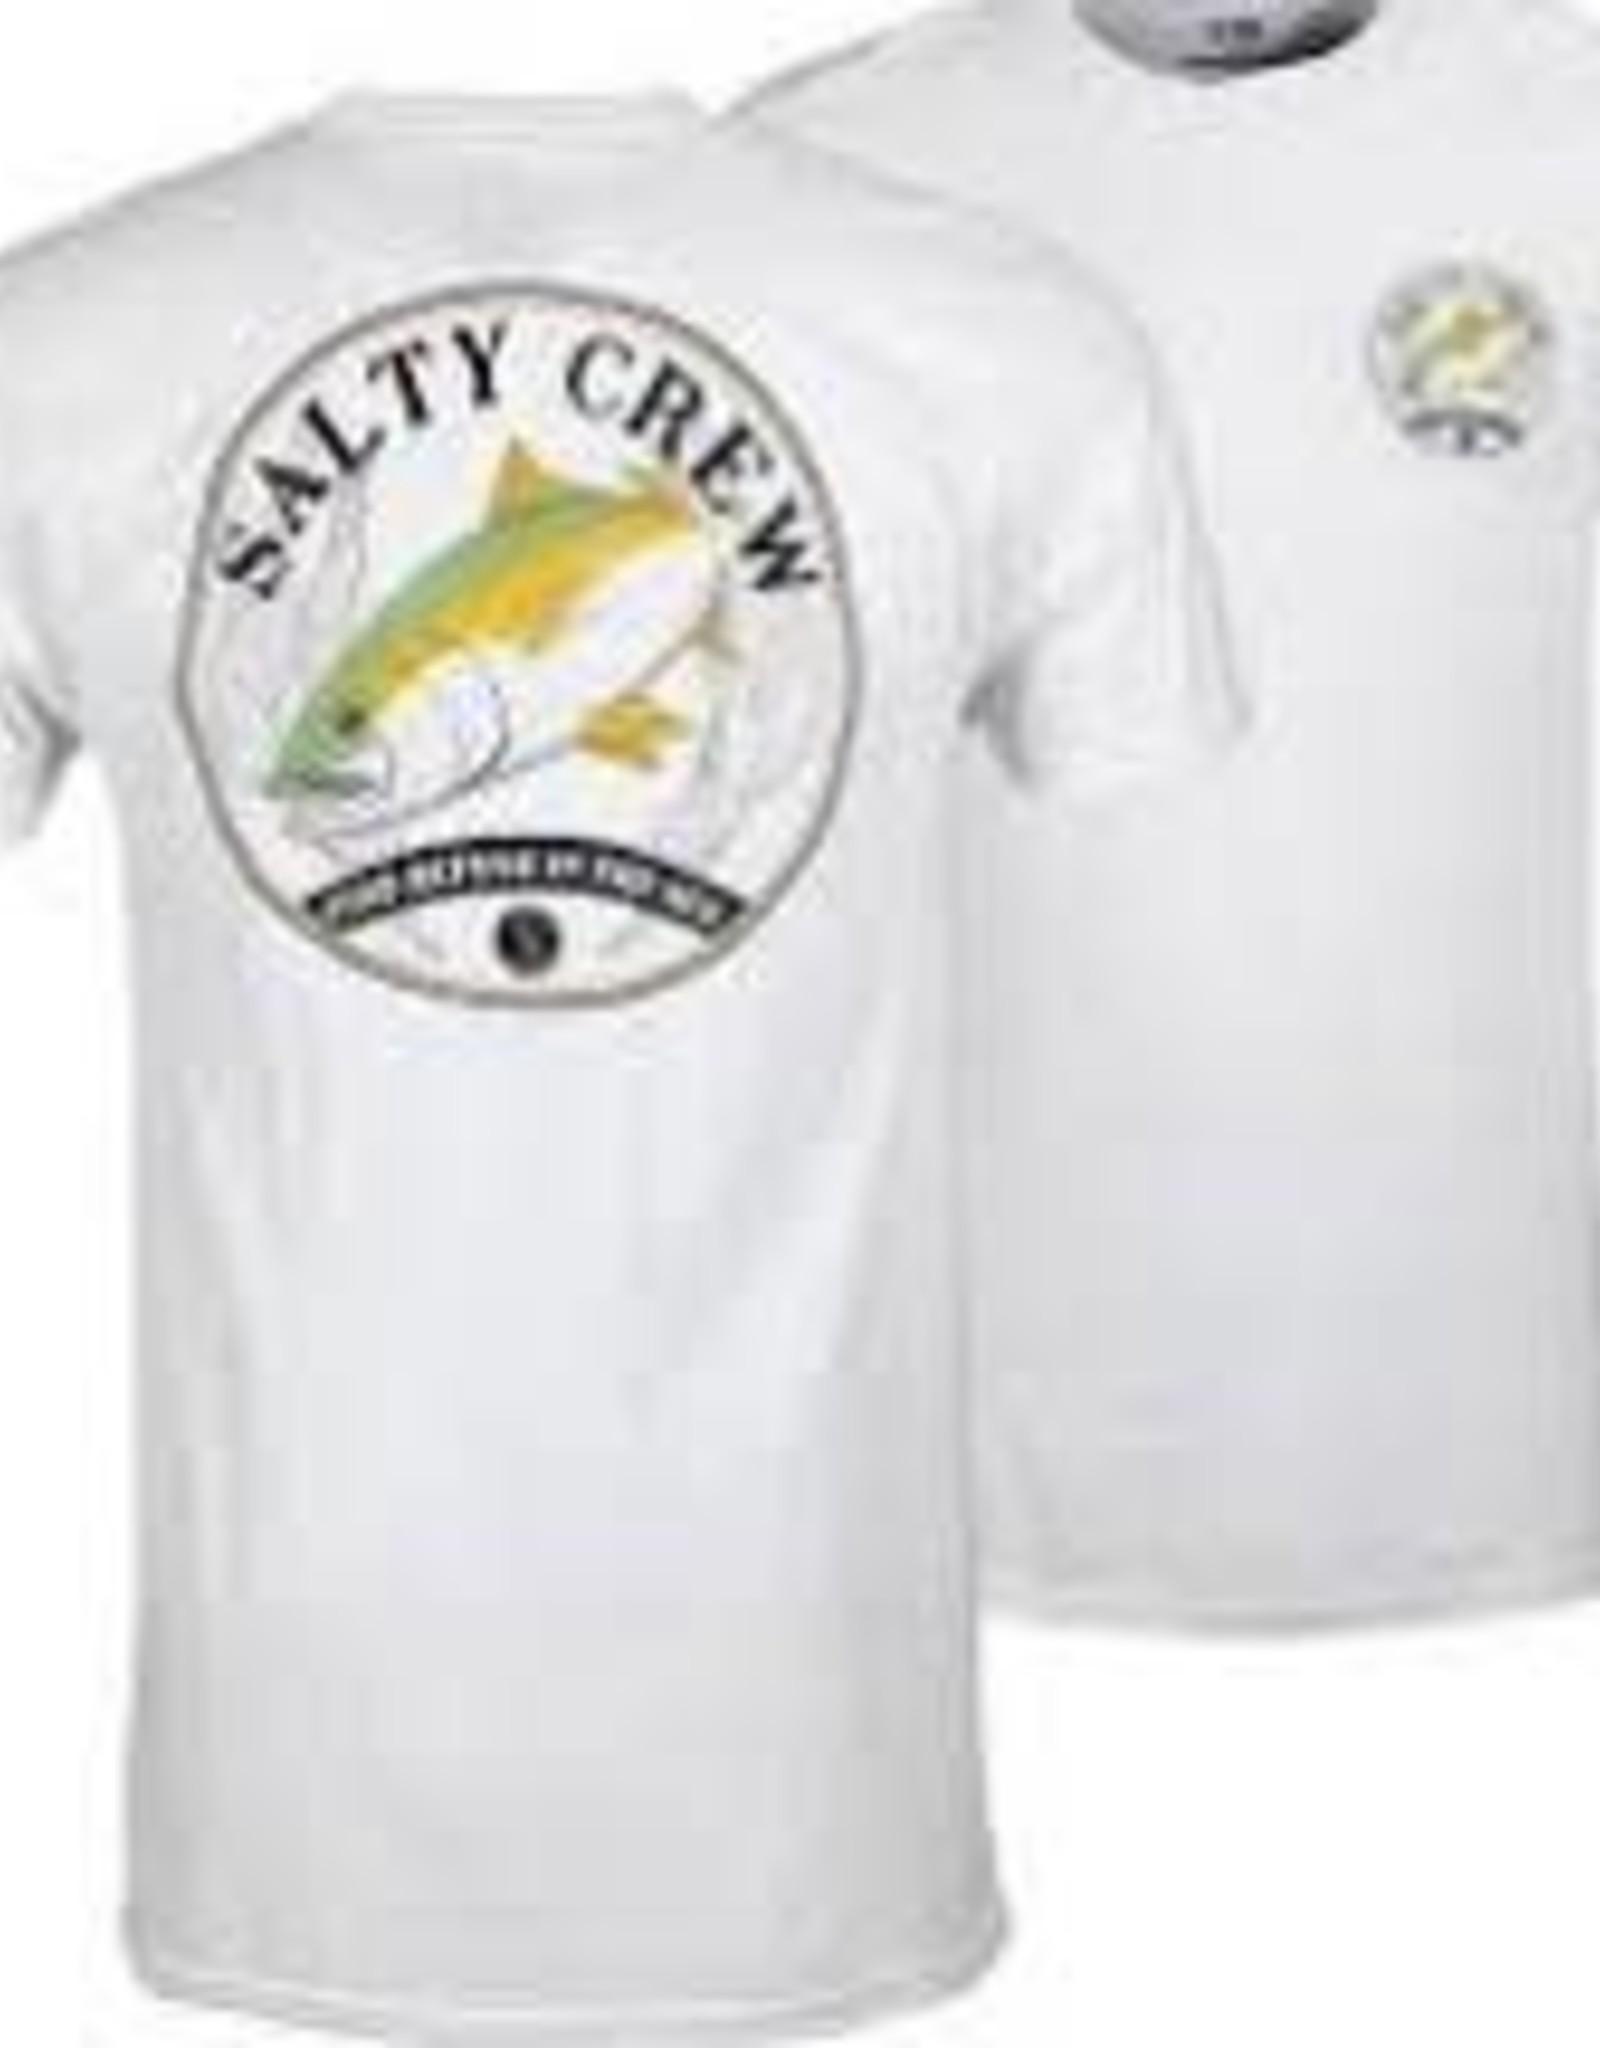 salty crew salty crew homeguard tshirt